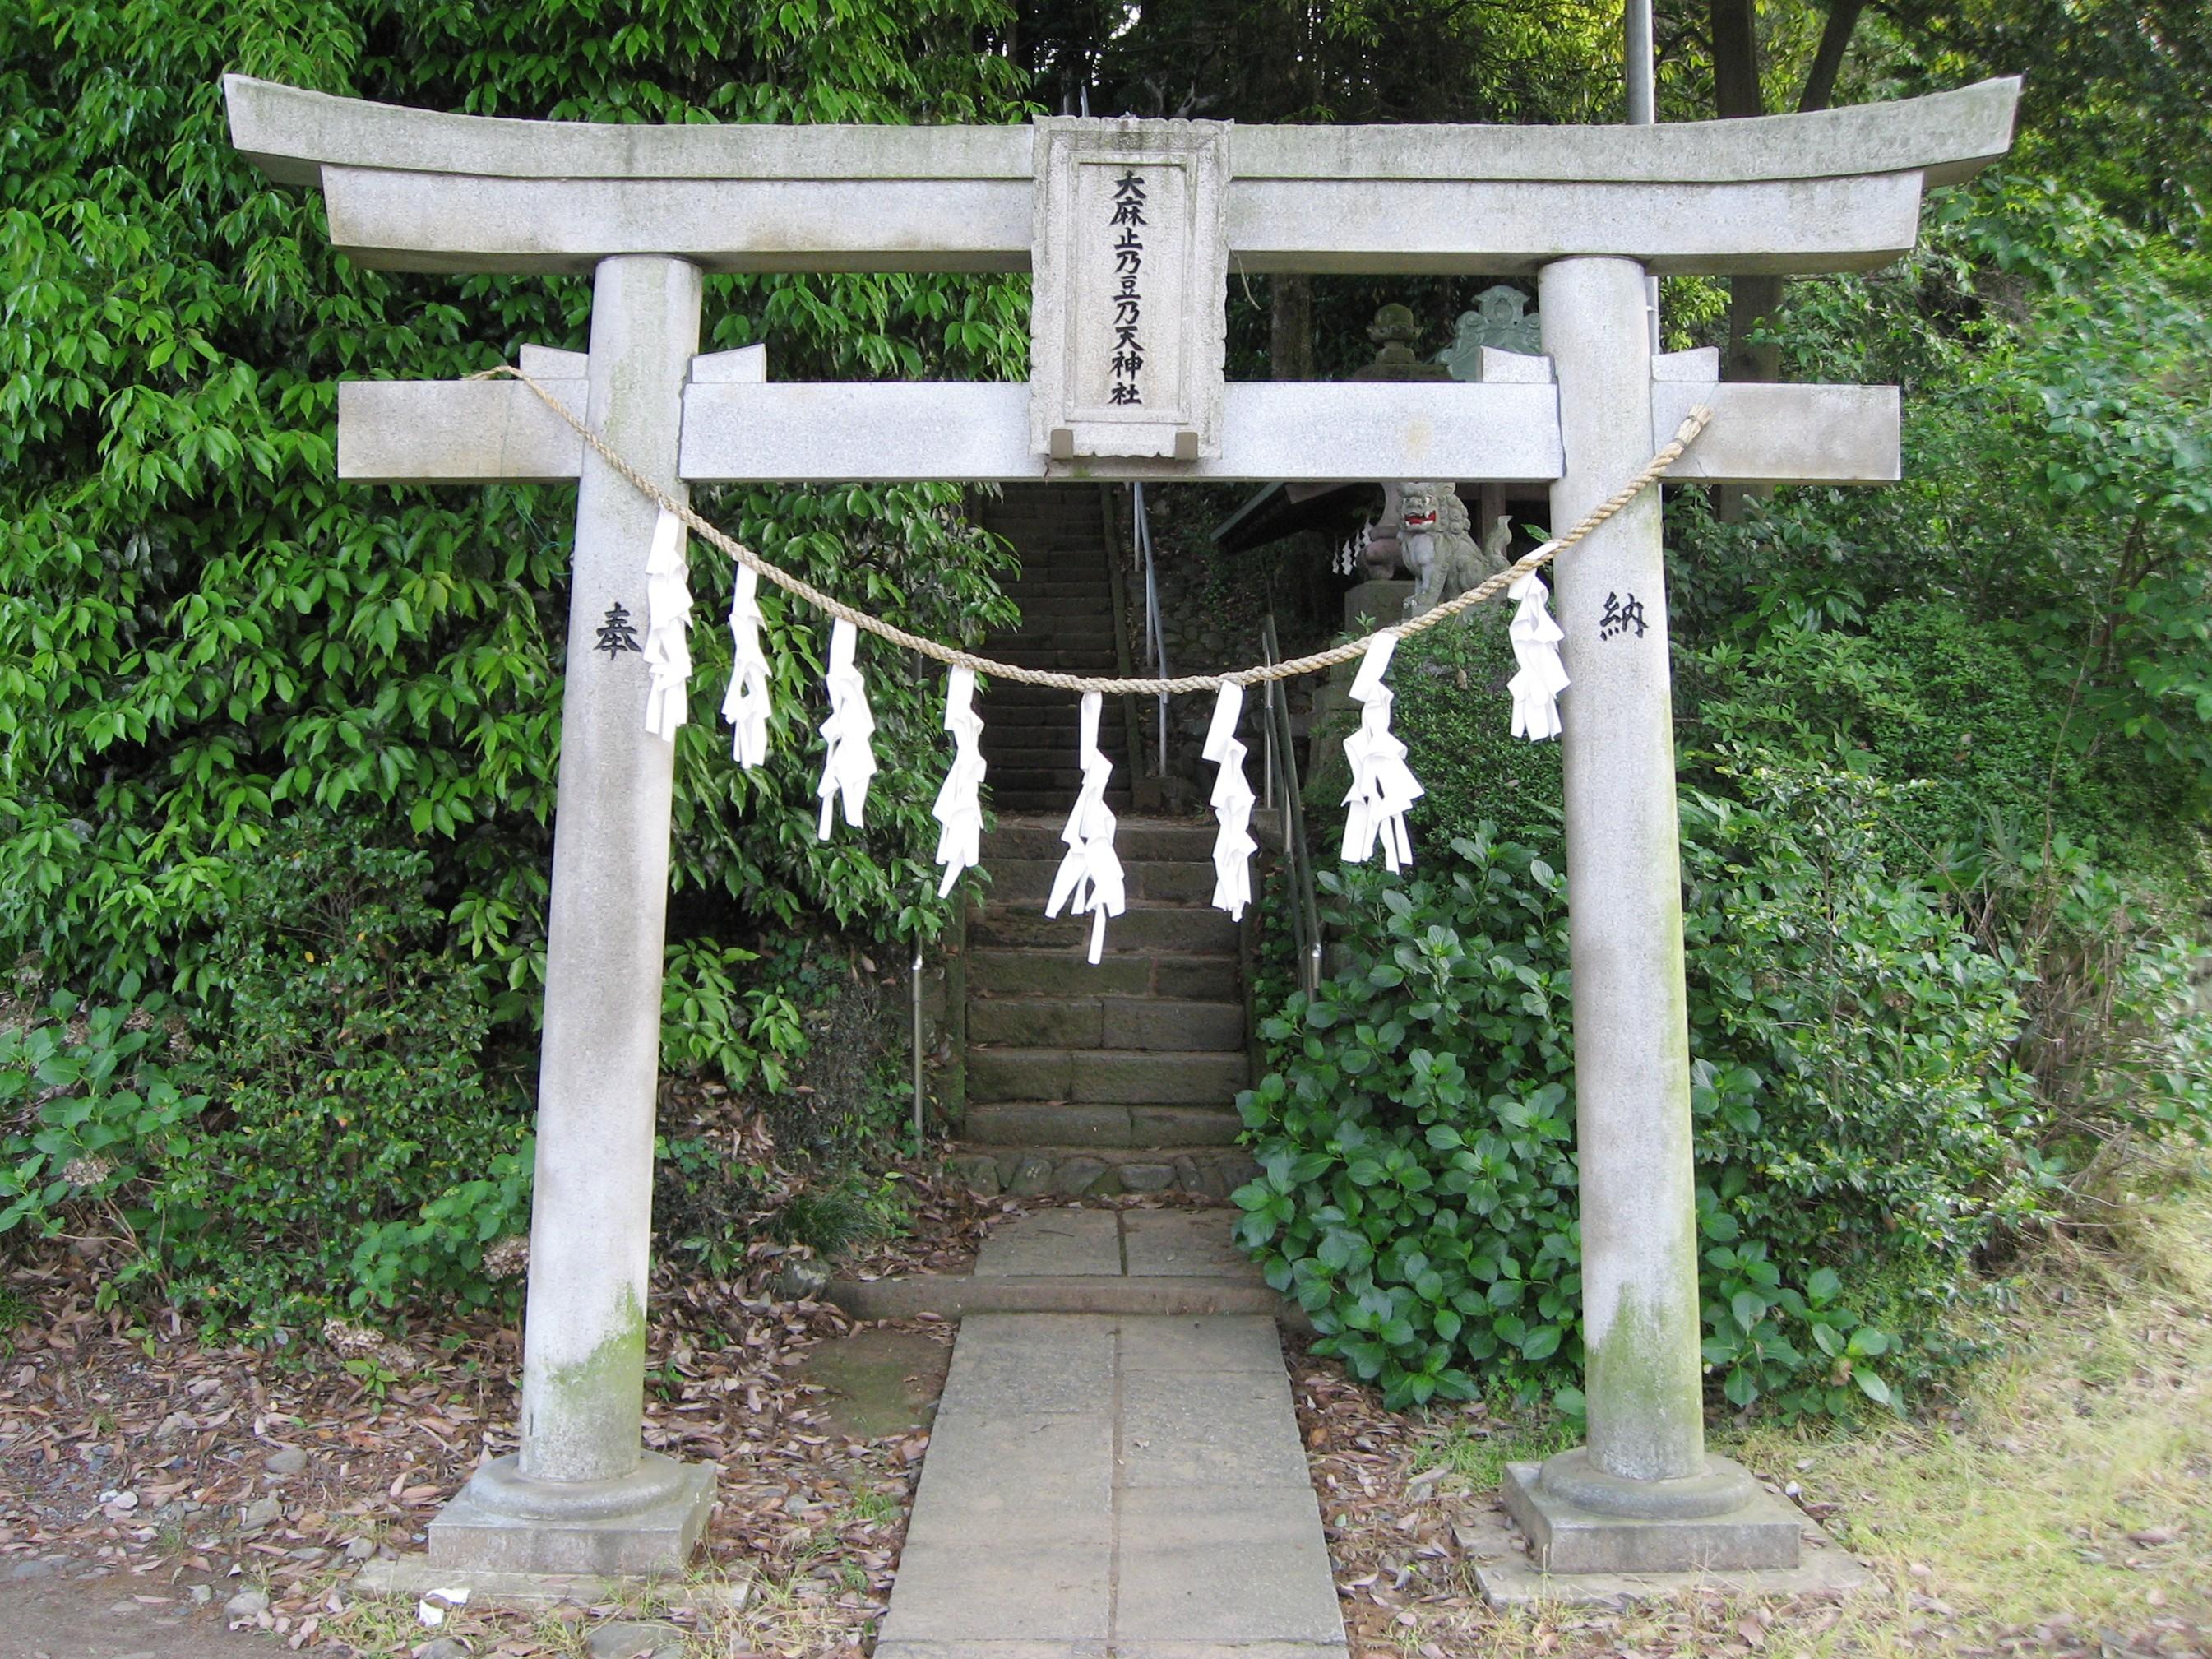 Shinto Religion Of Ancient Origin LibGuides At Mount St - Shinto religion